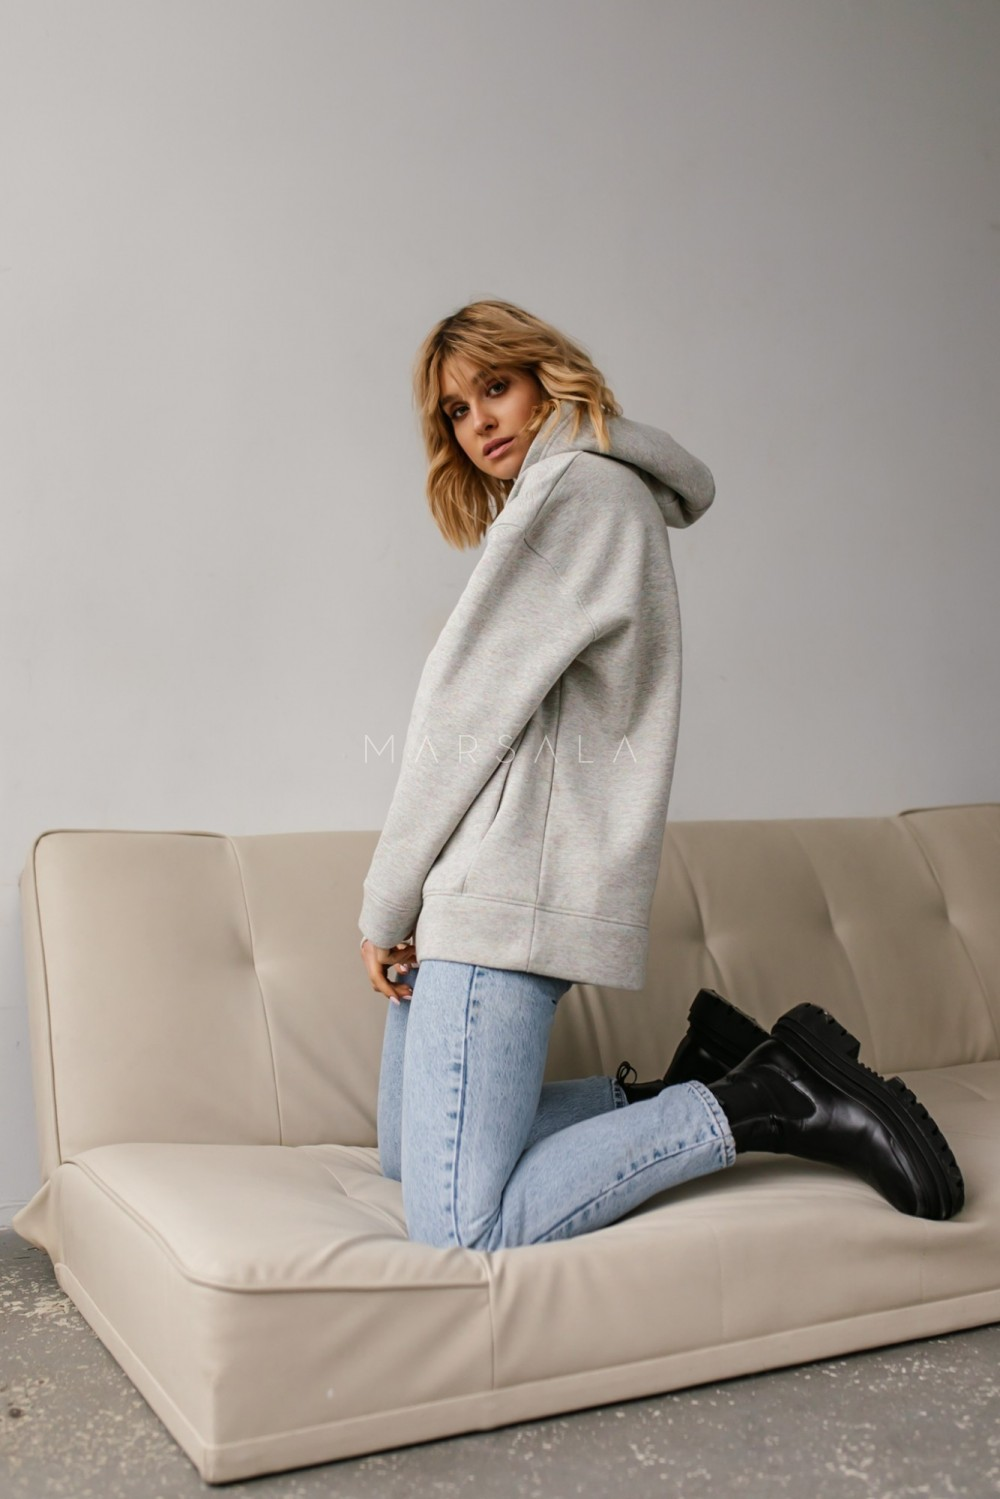 Bluza z kapturem w kolorze grey melange multikolor - CARDIFF by Marsala